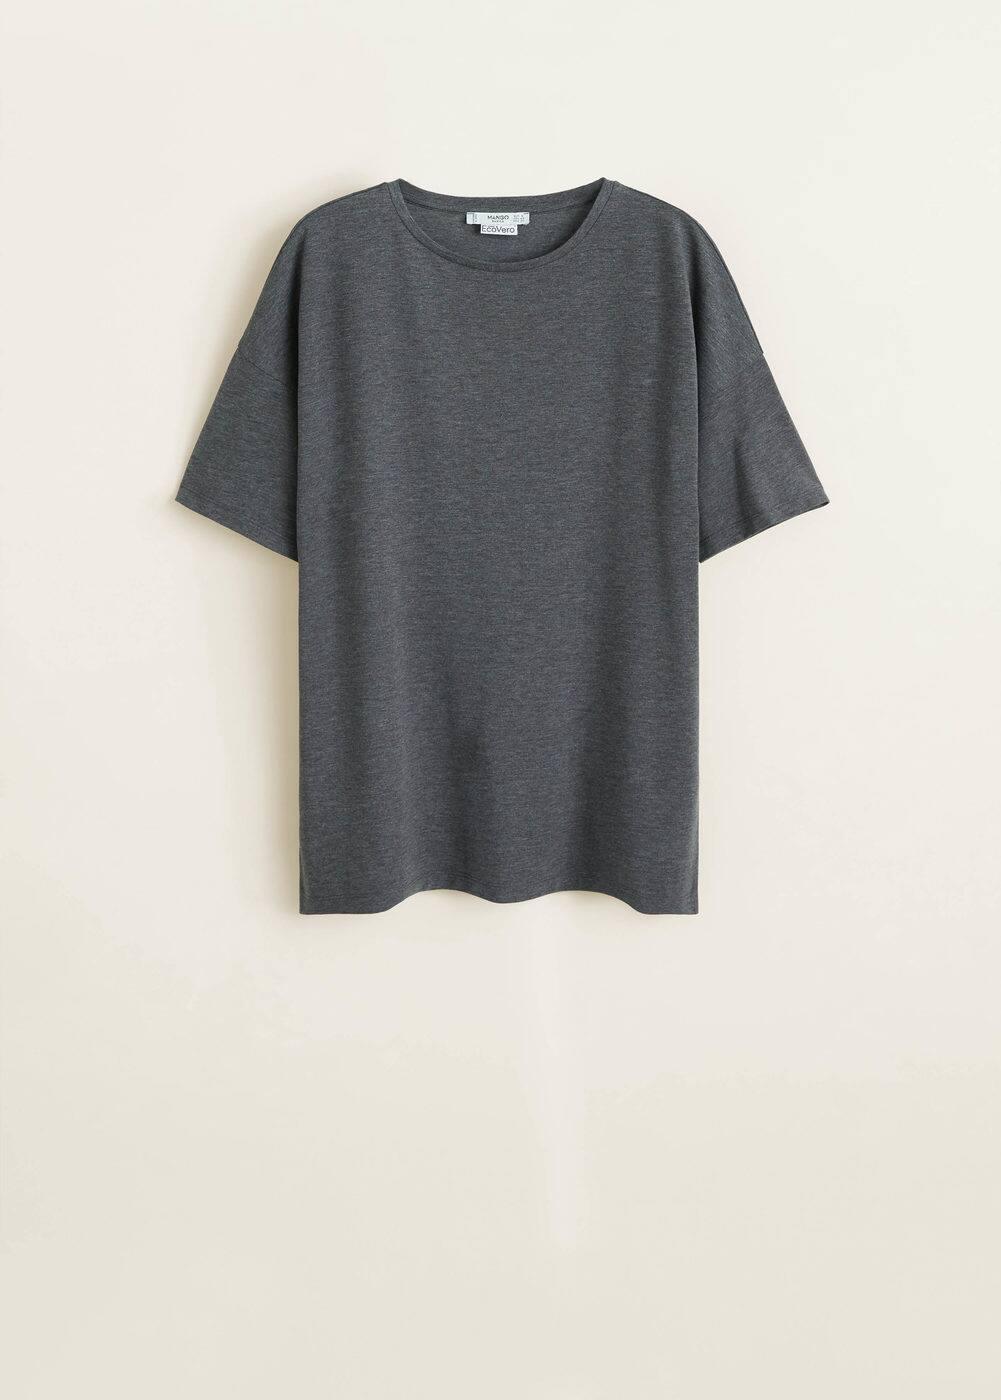 Mango - Basic t-shirt - 5